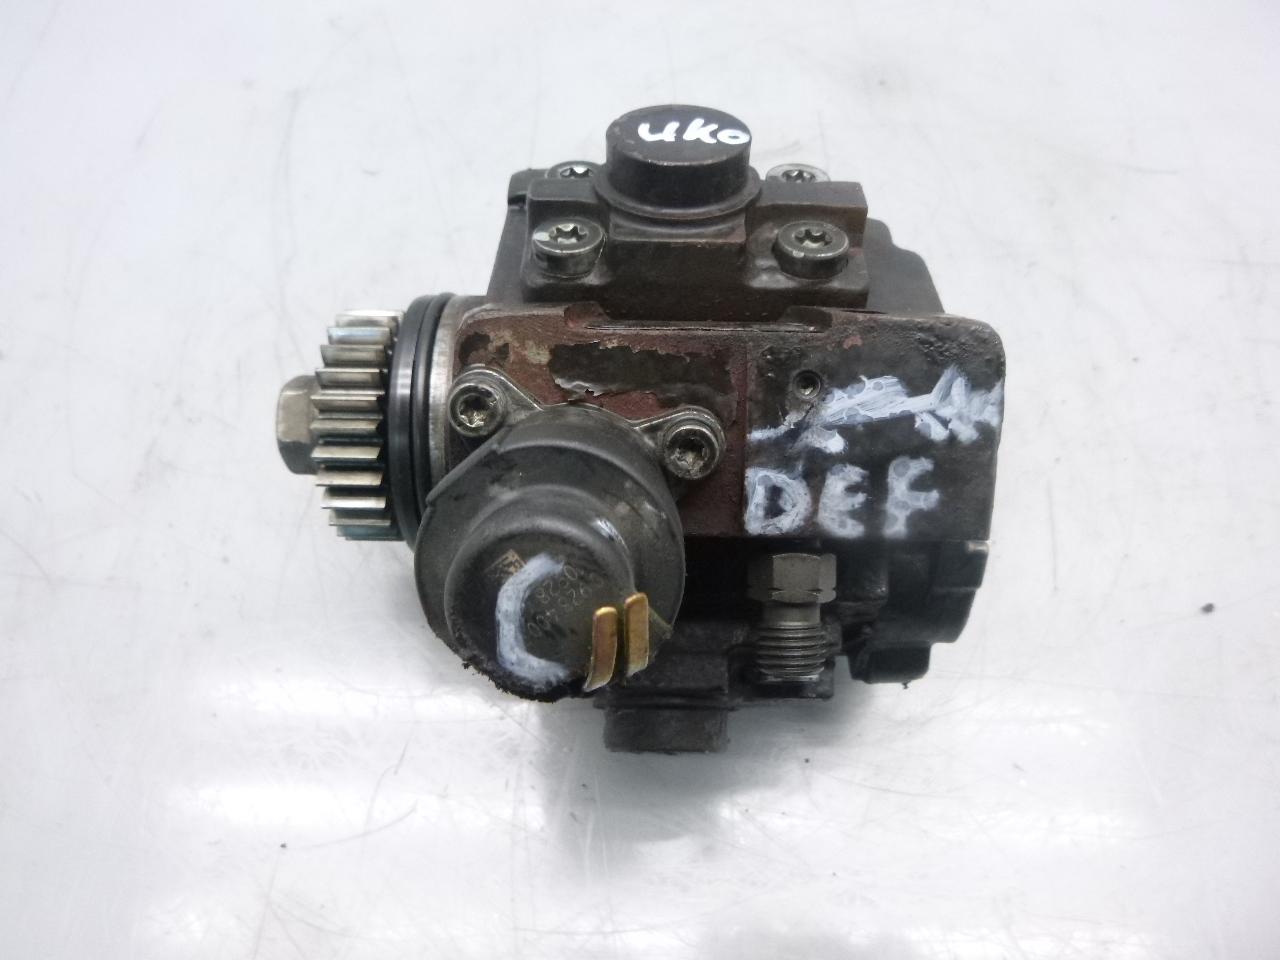 Hochdruckpumpe Opel Renault Vivaro J7 F7 E7 Trafic II 2,0 dCi M9R786 8200950493